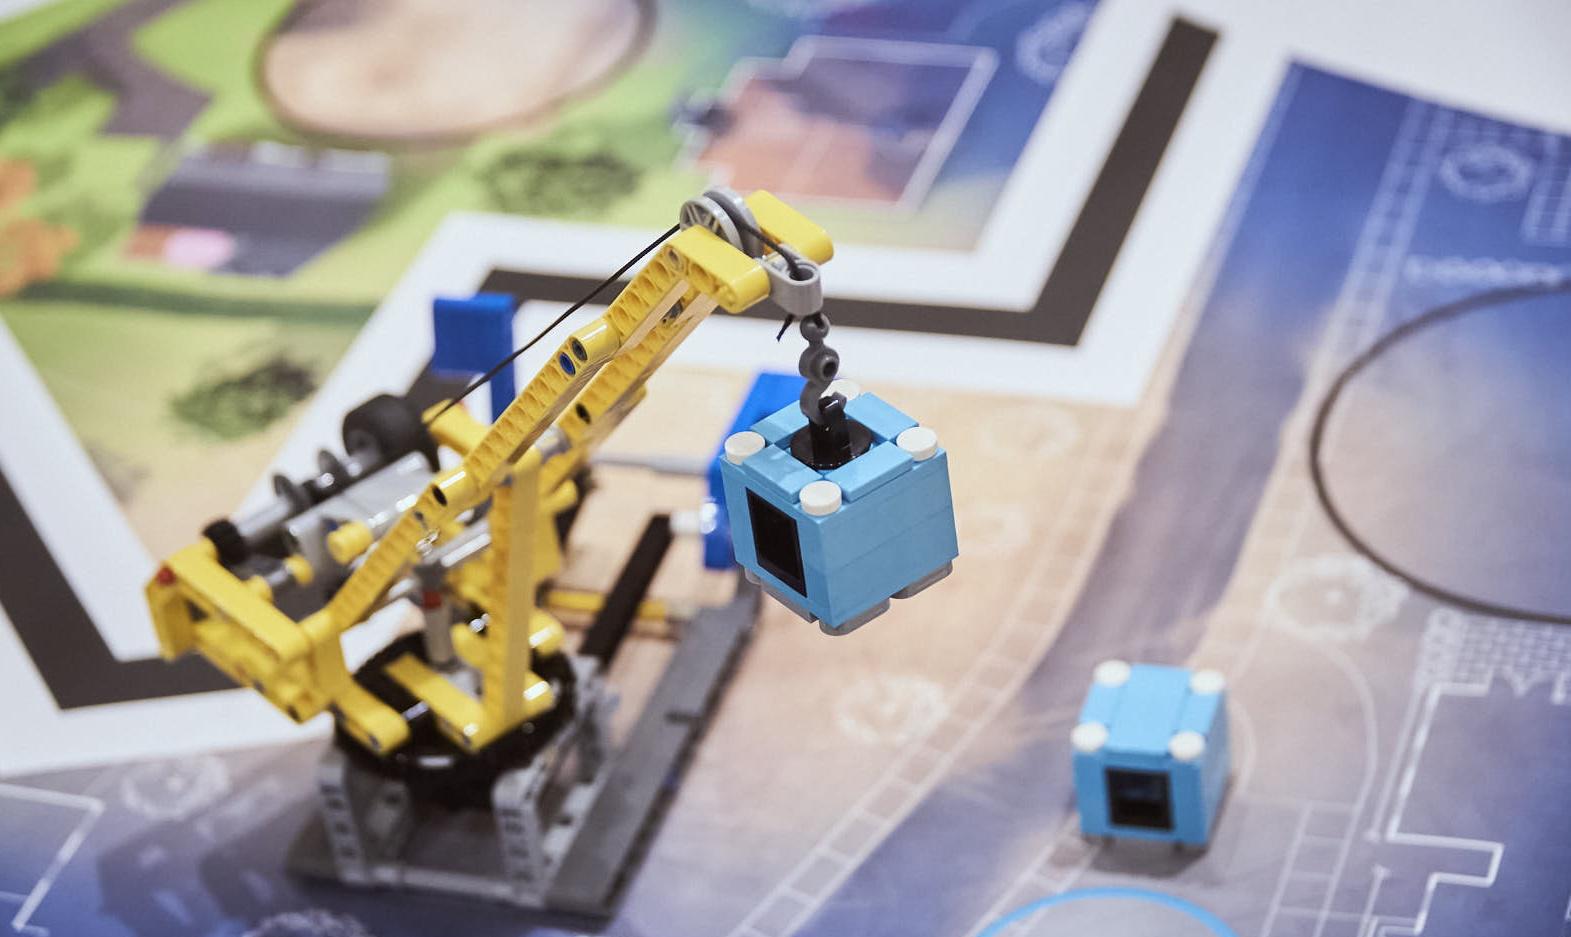 Éxito de convocatoria en el primer Torneo FIRST LEGO League de Aragón